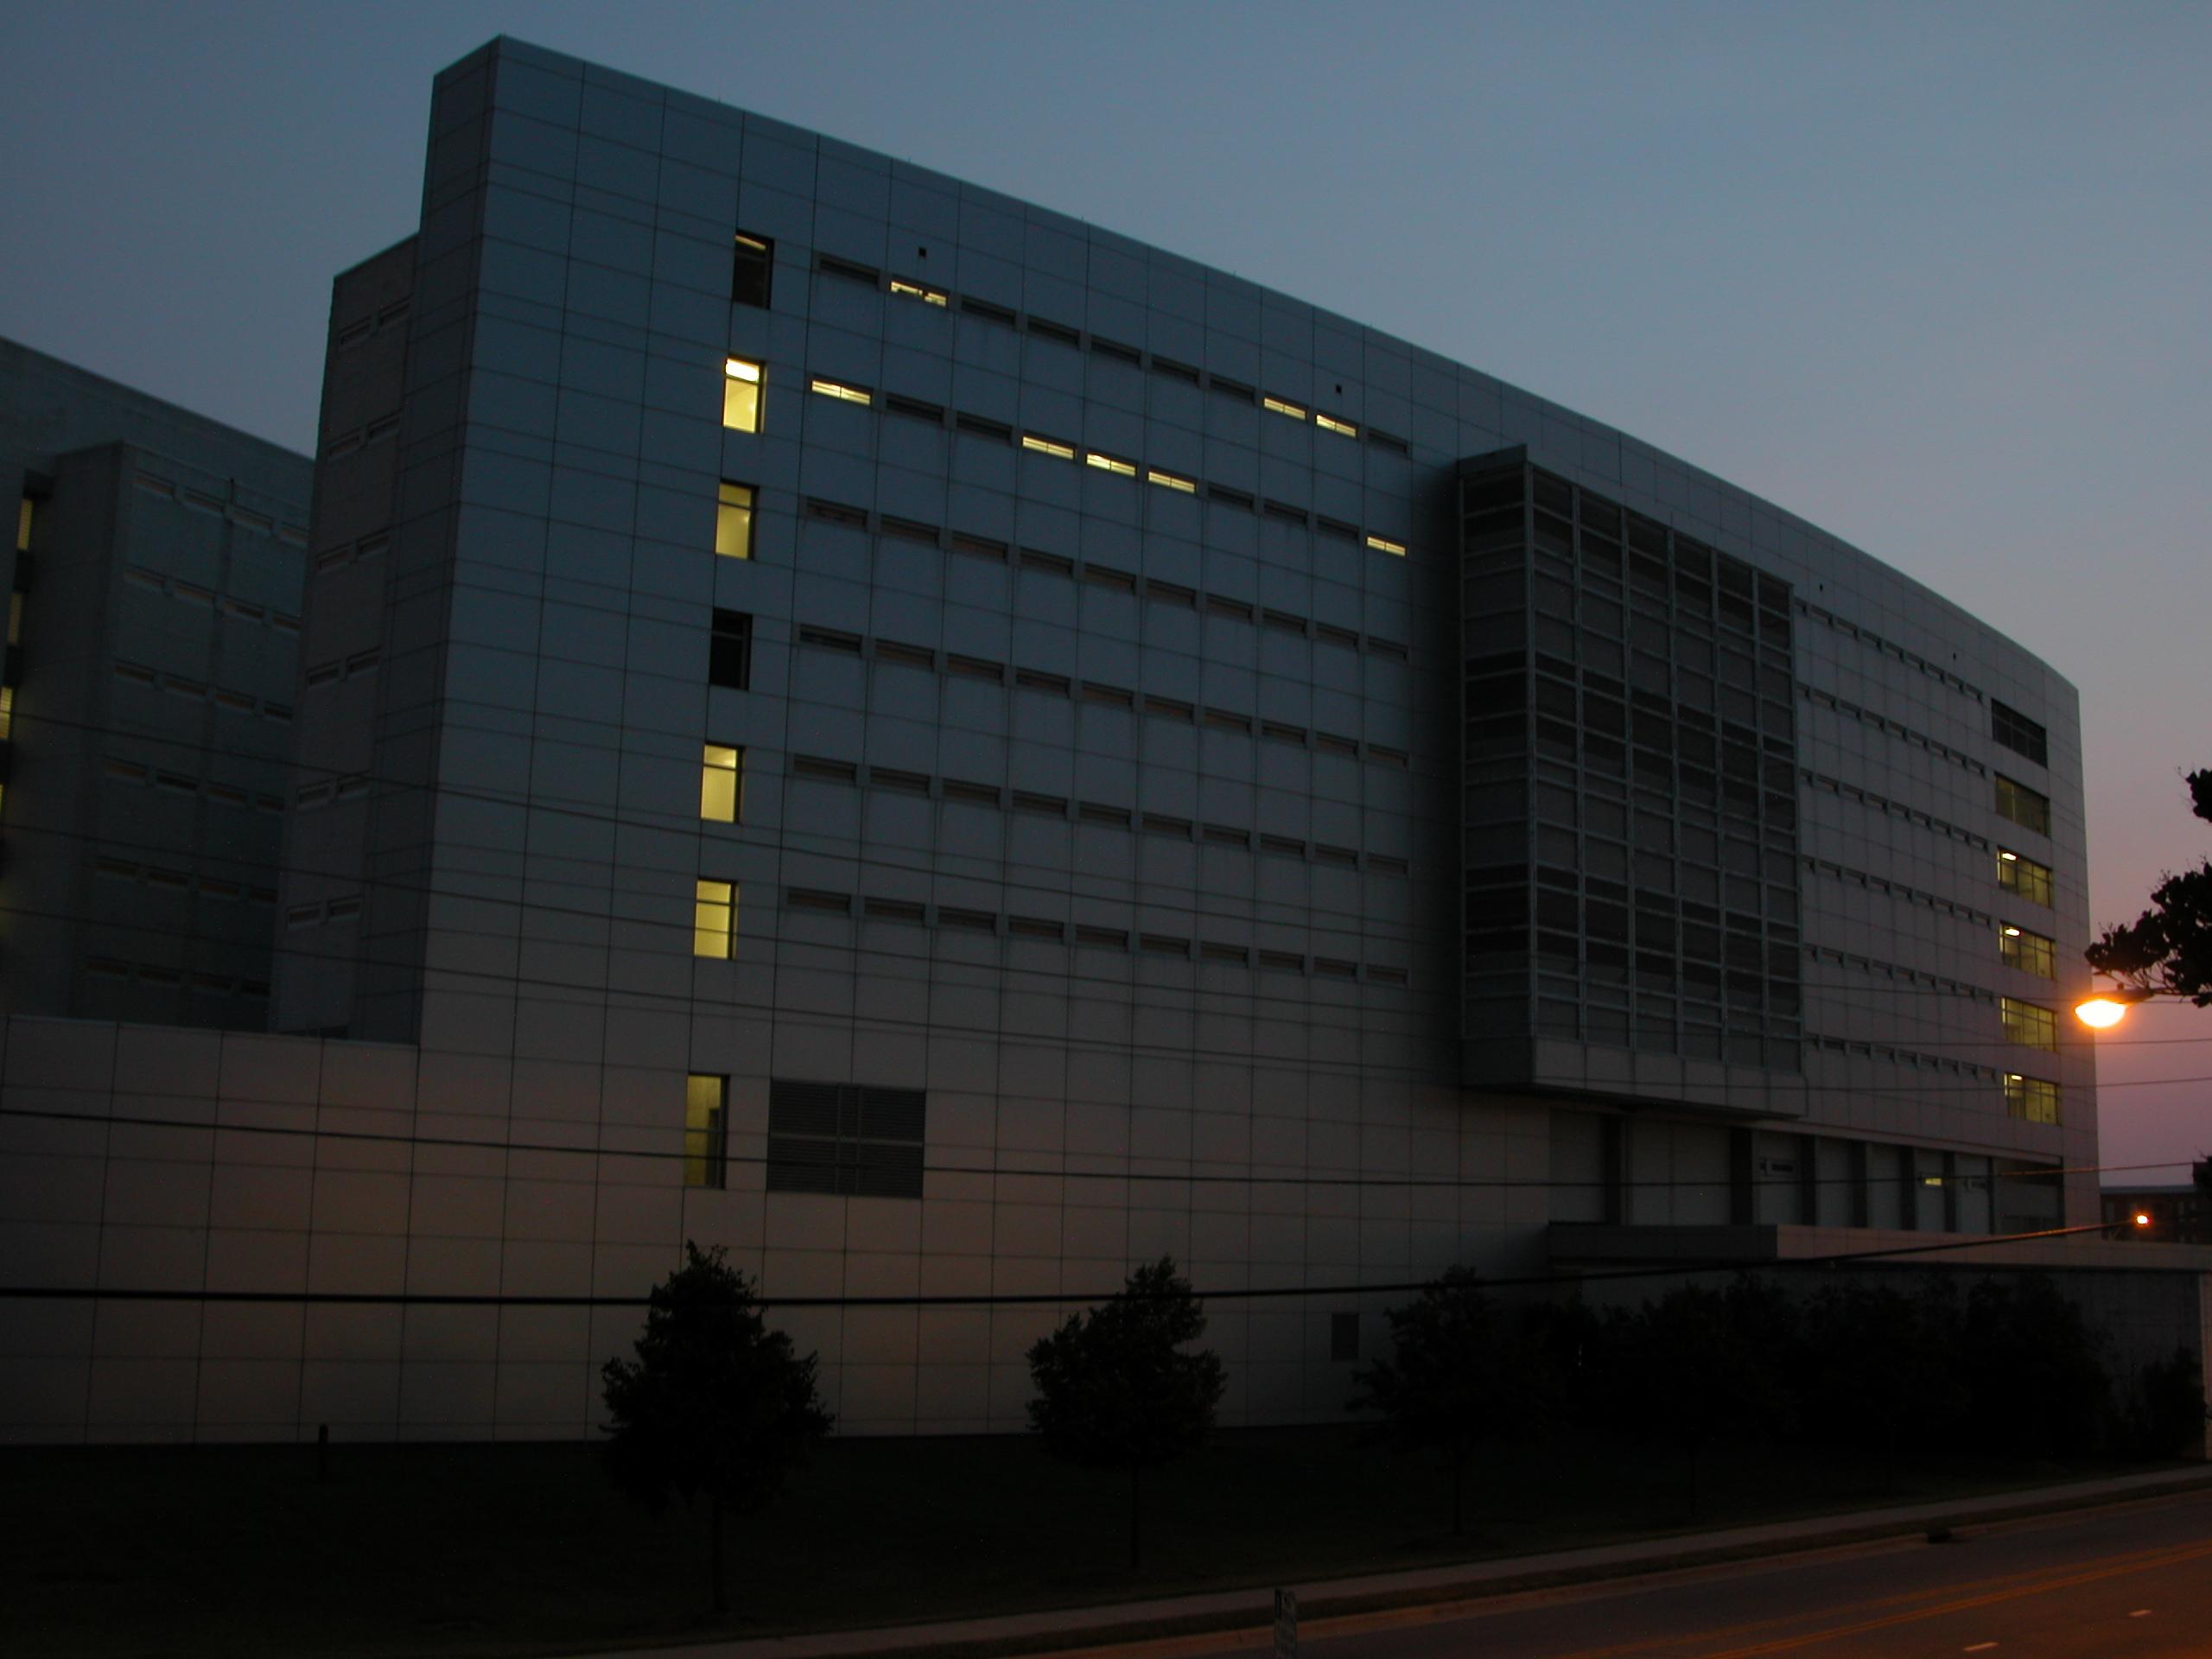 File:2003-07-17 Durham County Jail at night.jpg - Wikimedia Commonsbalance of durham county